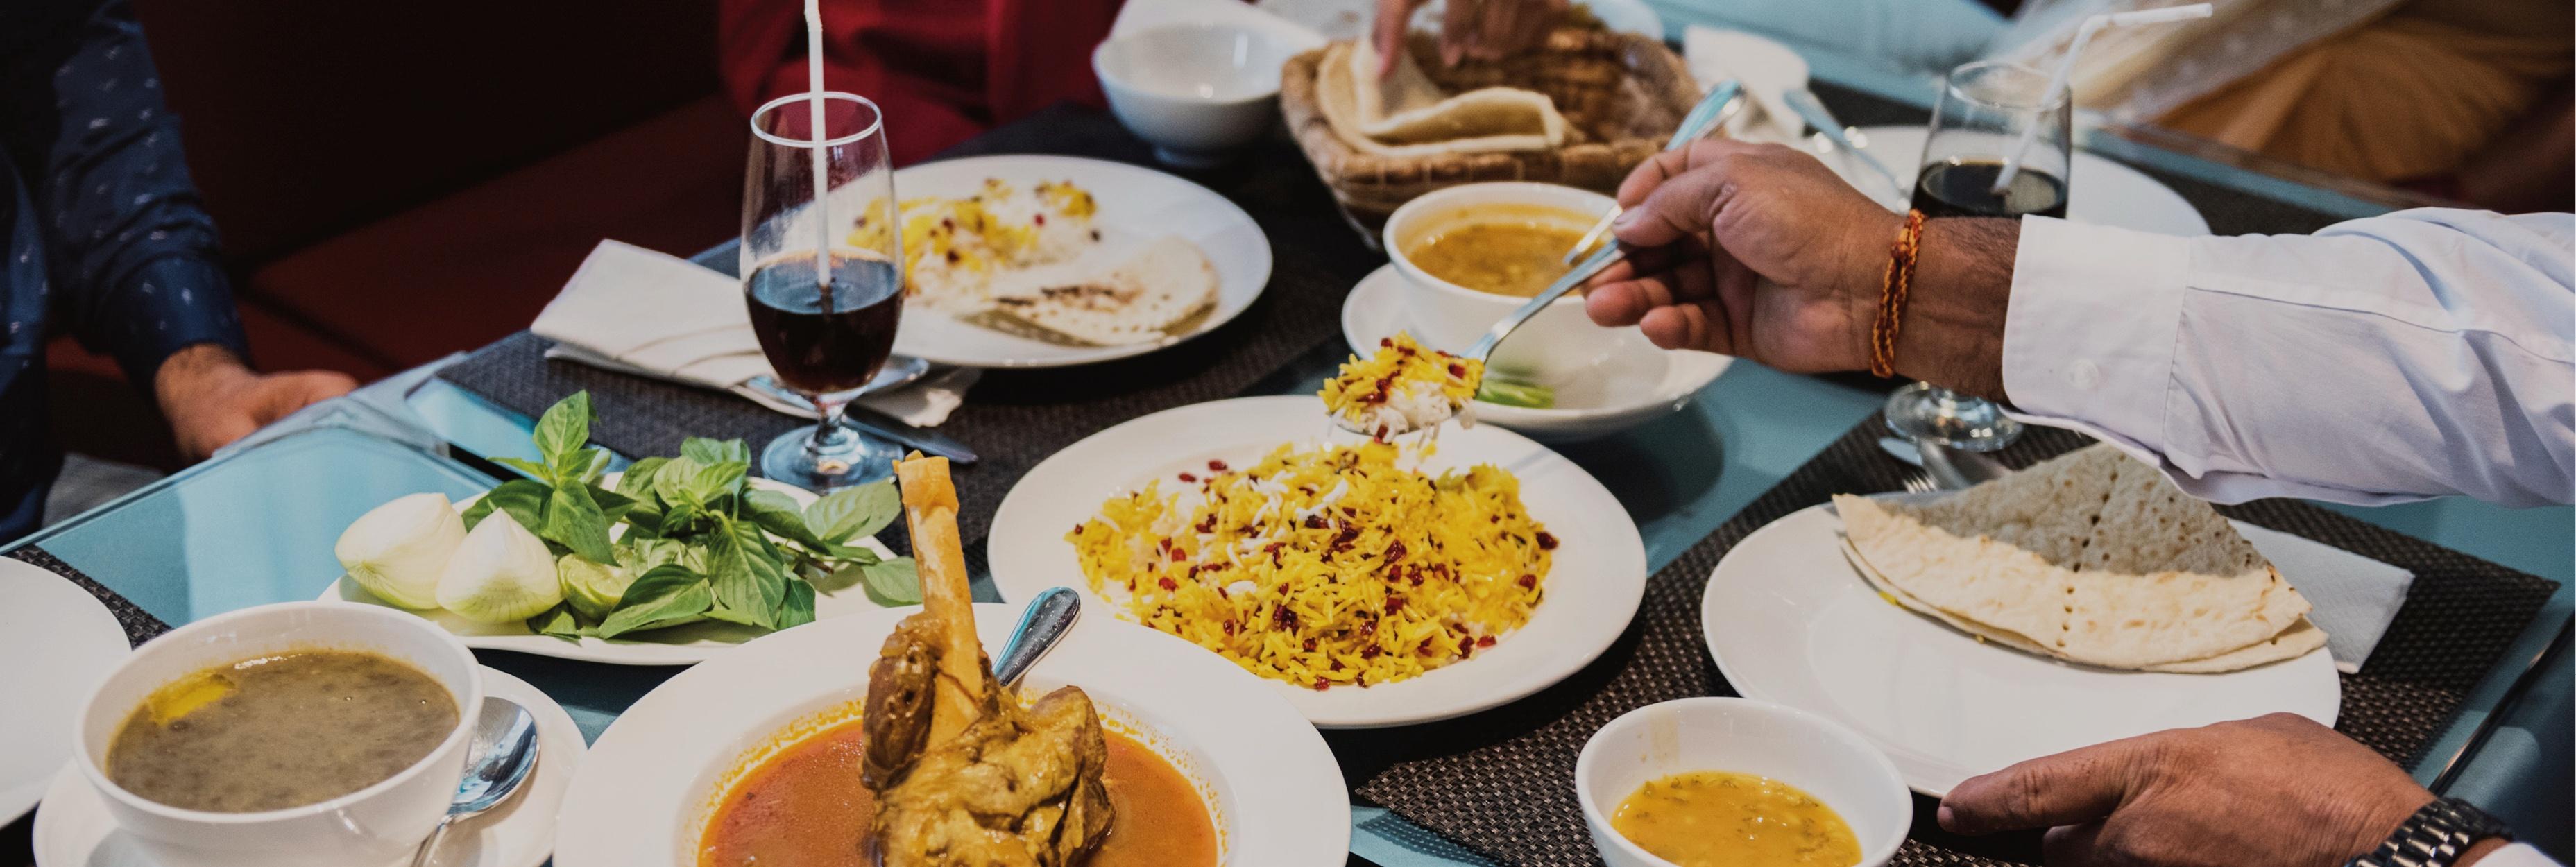 5 tips to reduce food waste during Ramadan